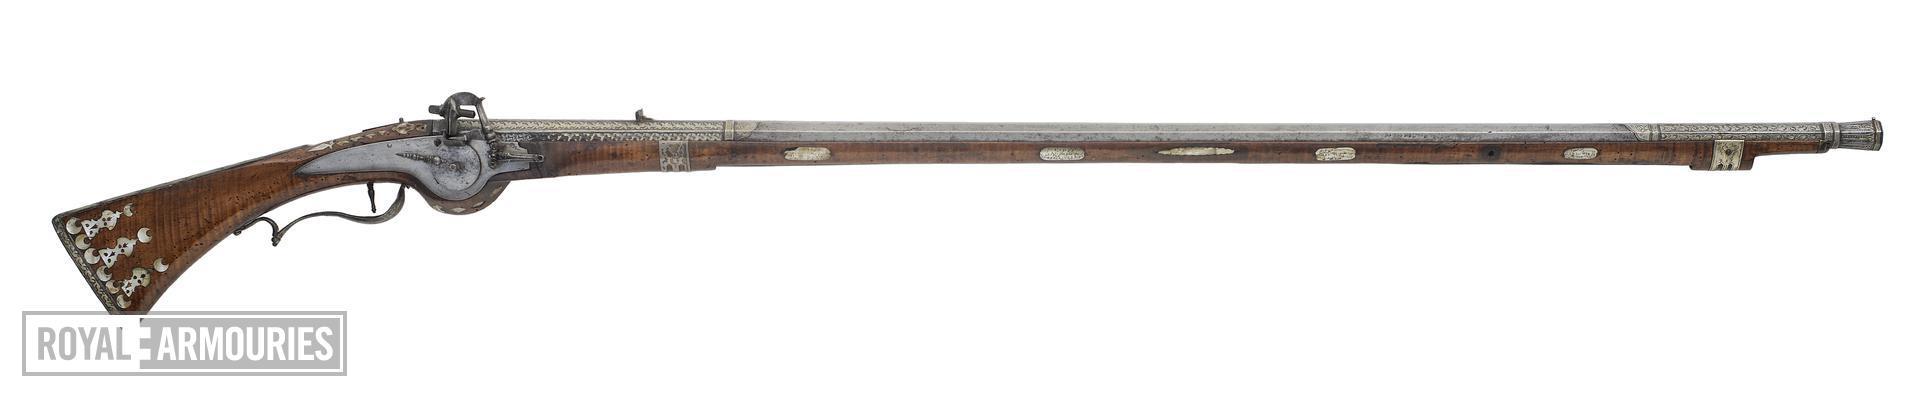 Wheellock musket By Rajab